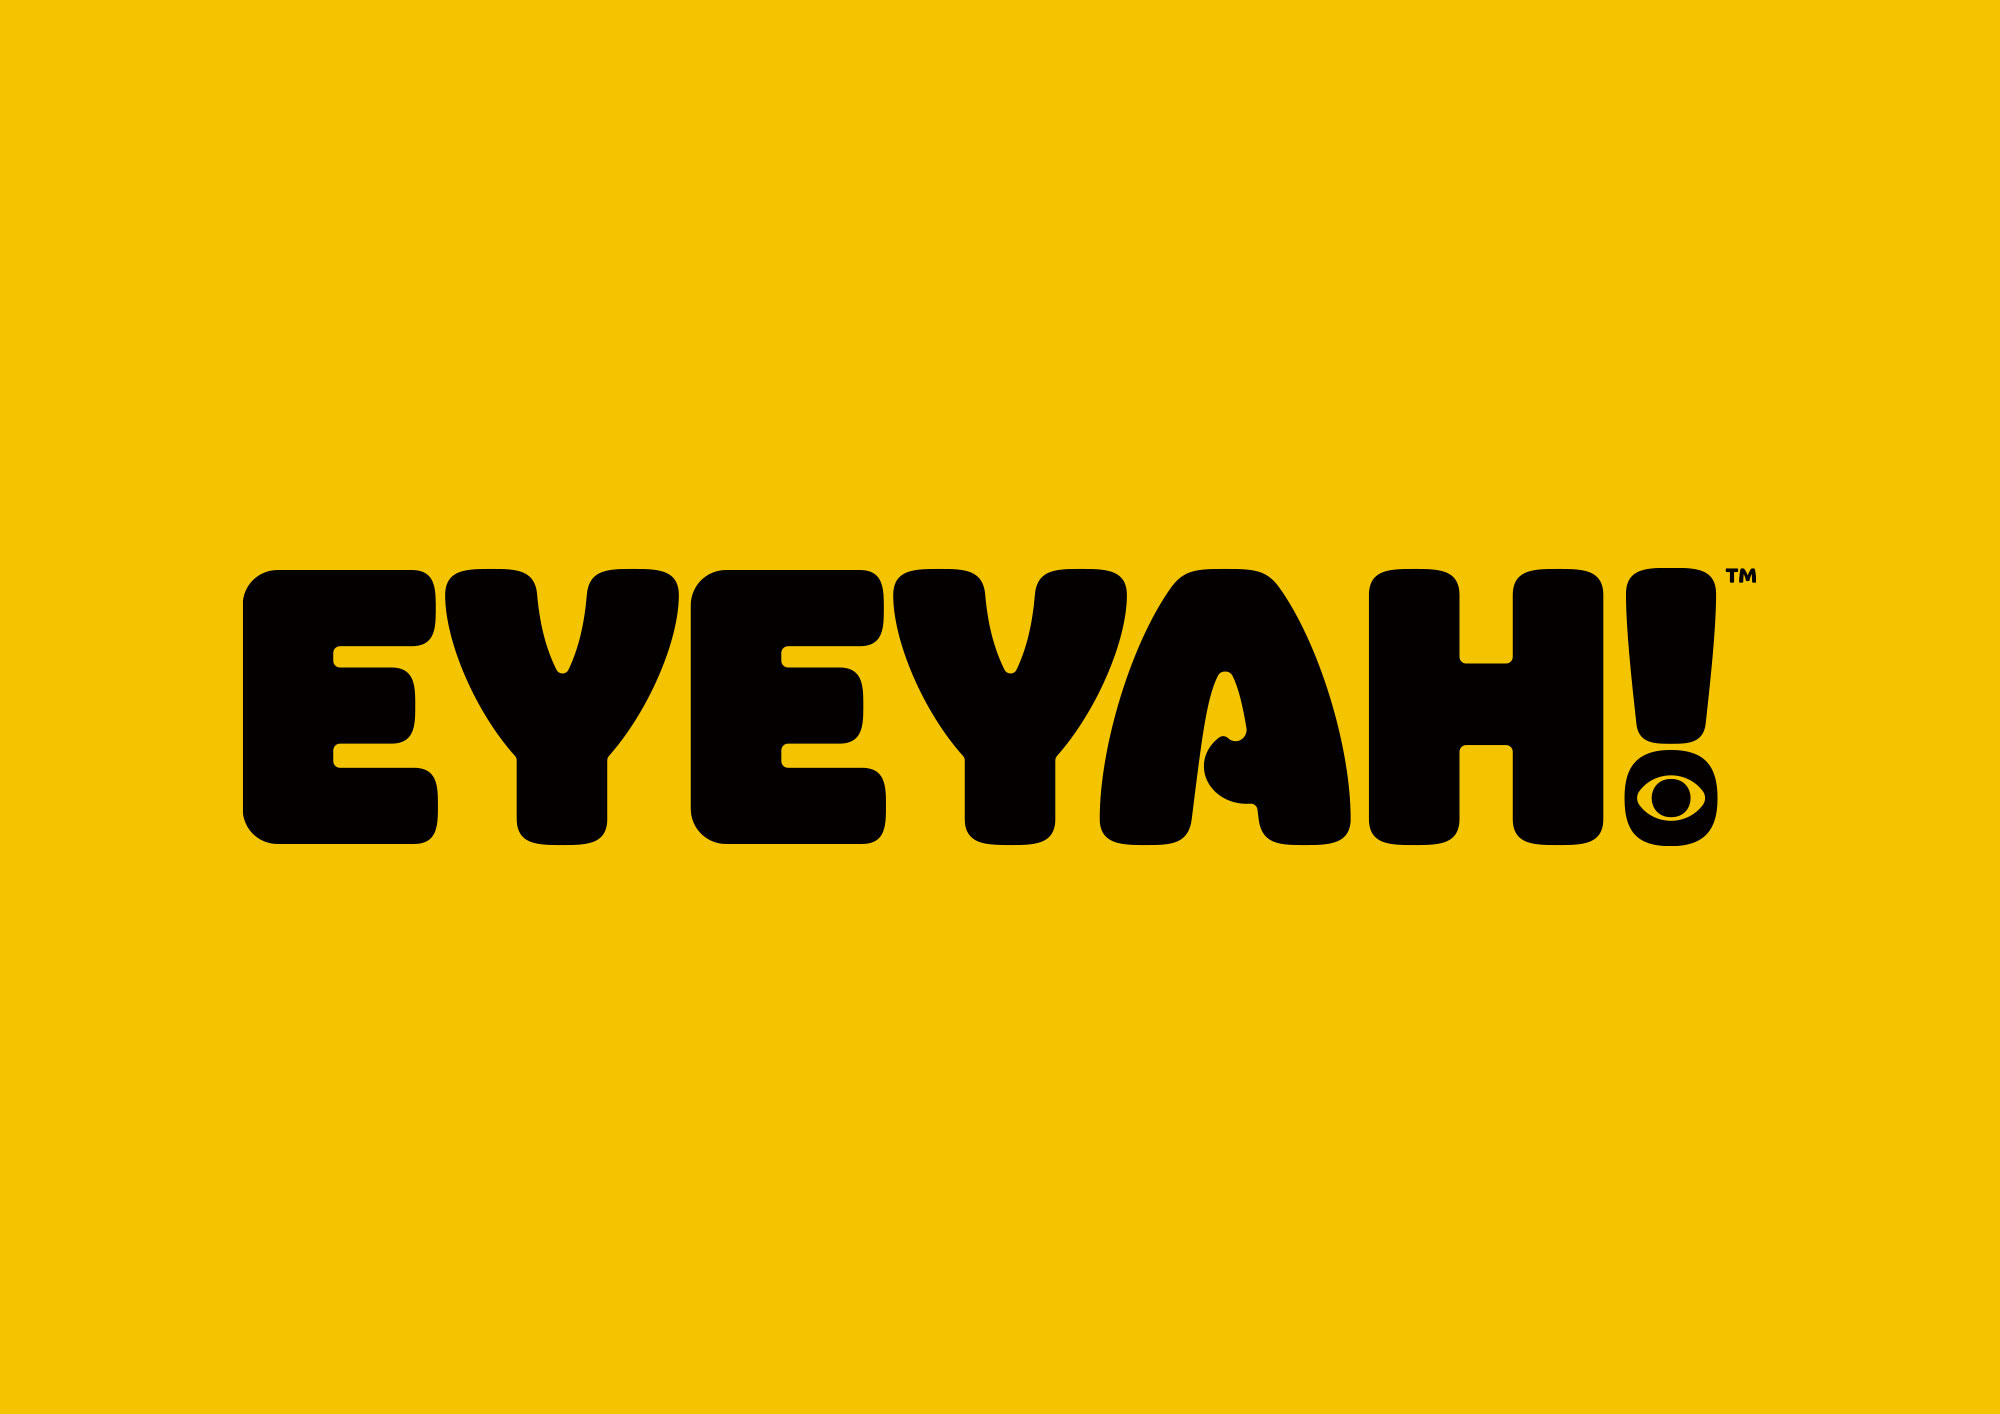 Identity design for EYEYAH! magazine brand by Singapore based brand strategy and creative design consultancy, BÜRO UFHO.